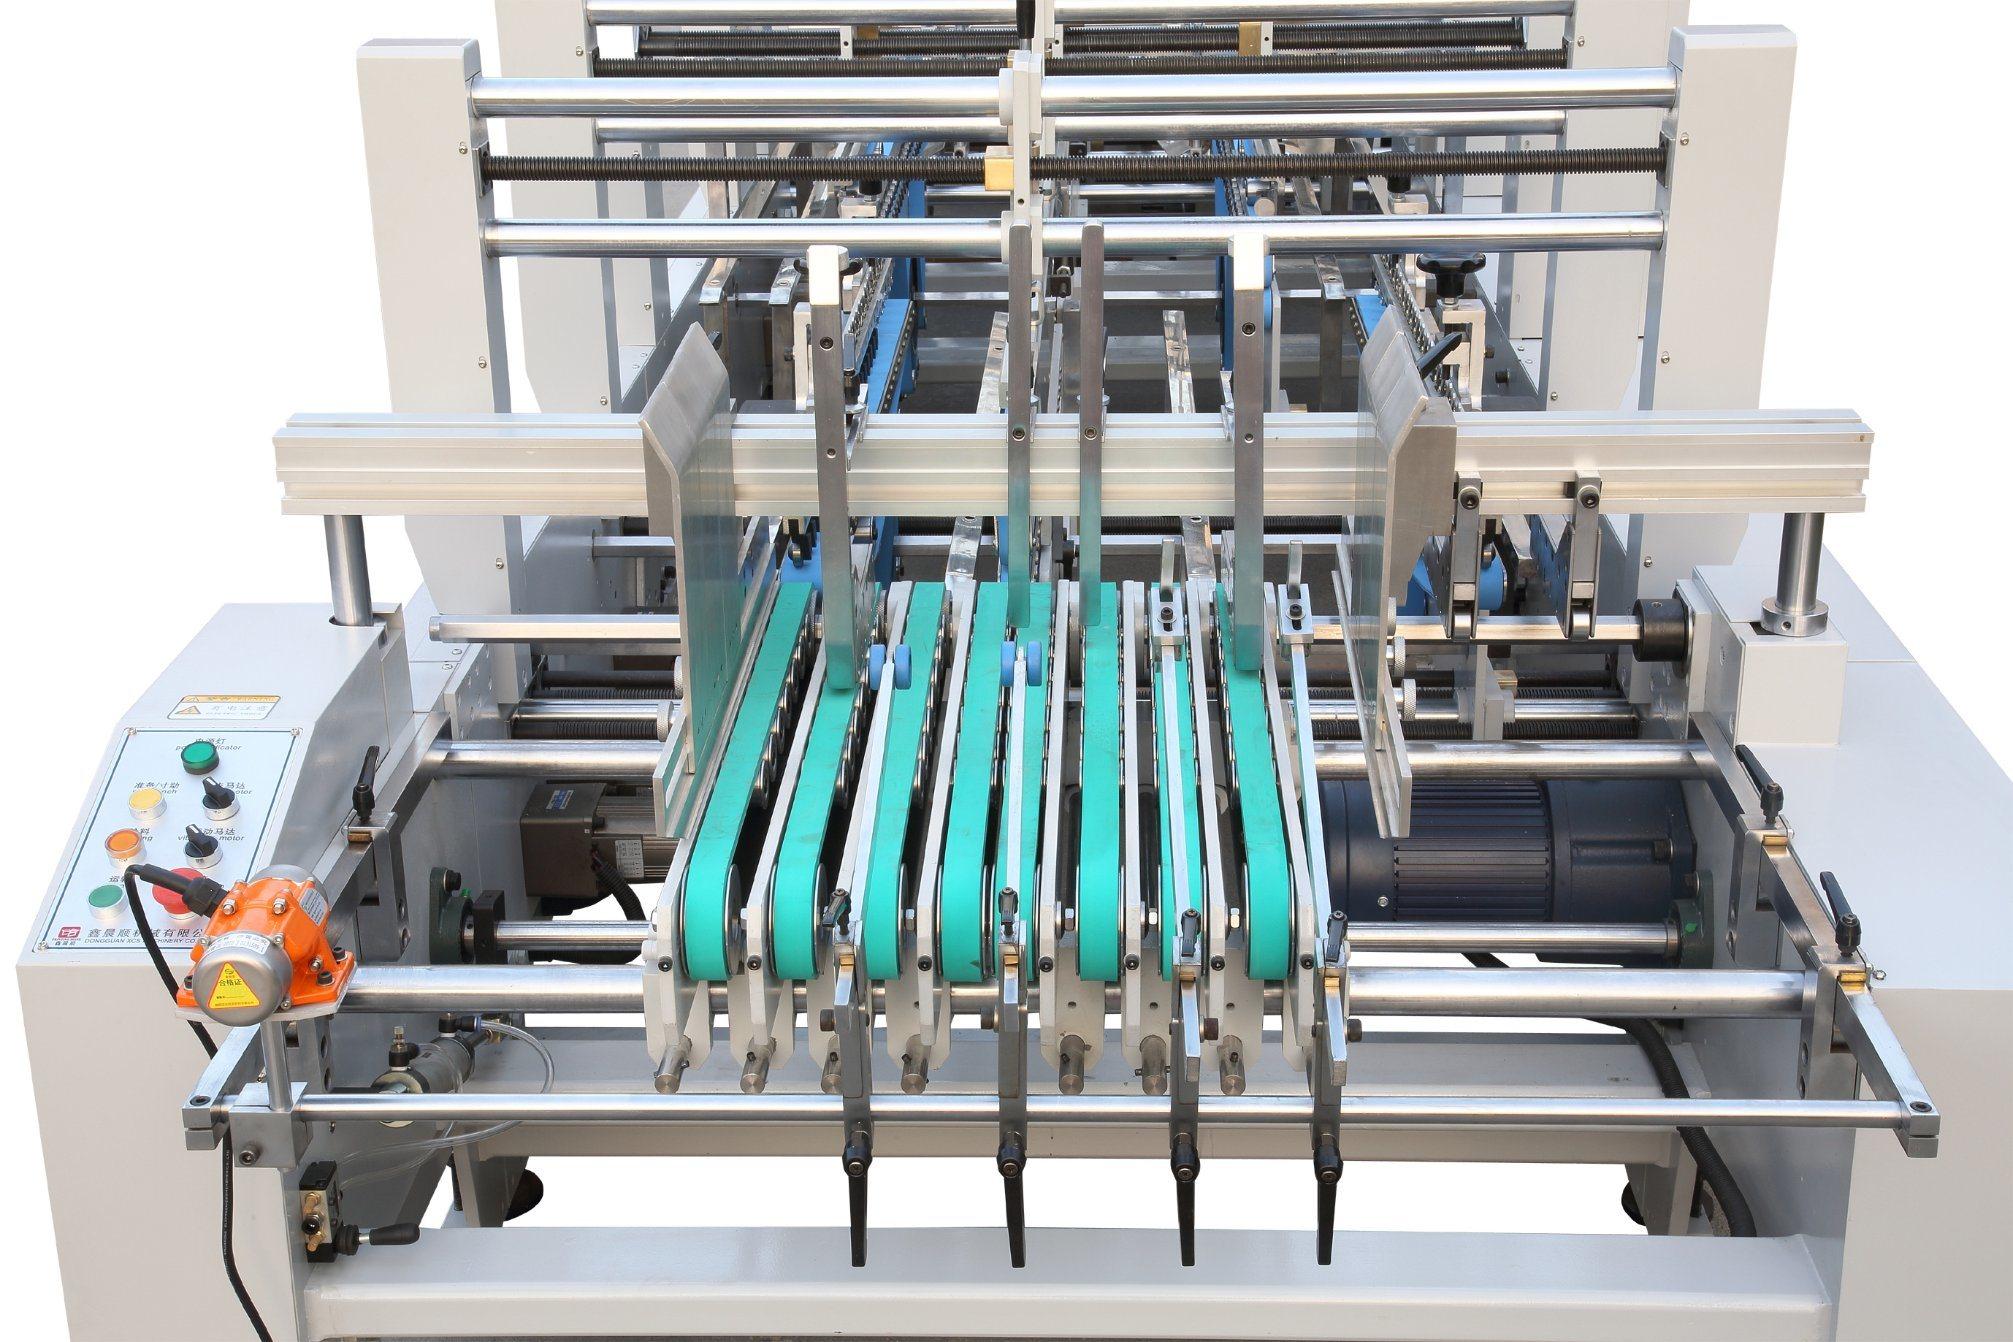 Xcs-1100AC High-Speed Multifunctional Folder Gluer Machine